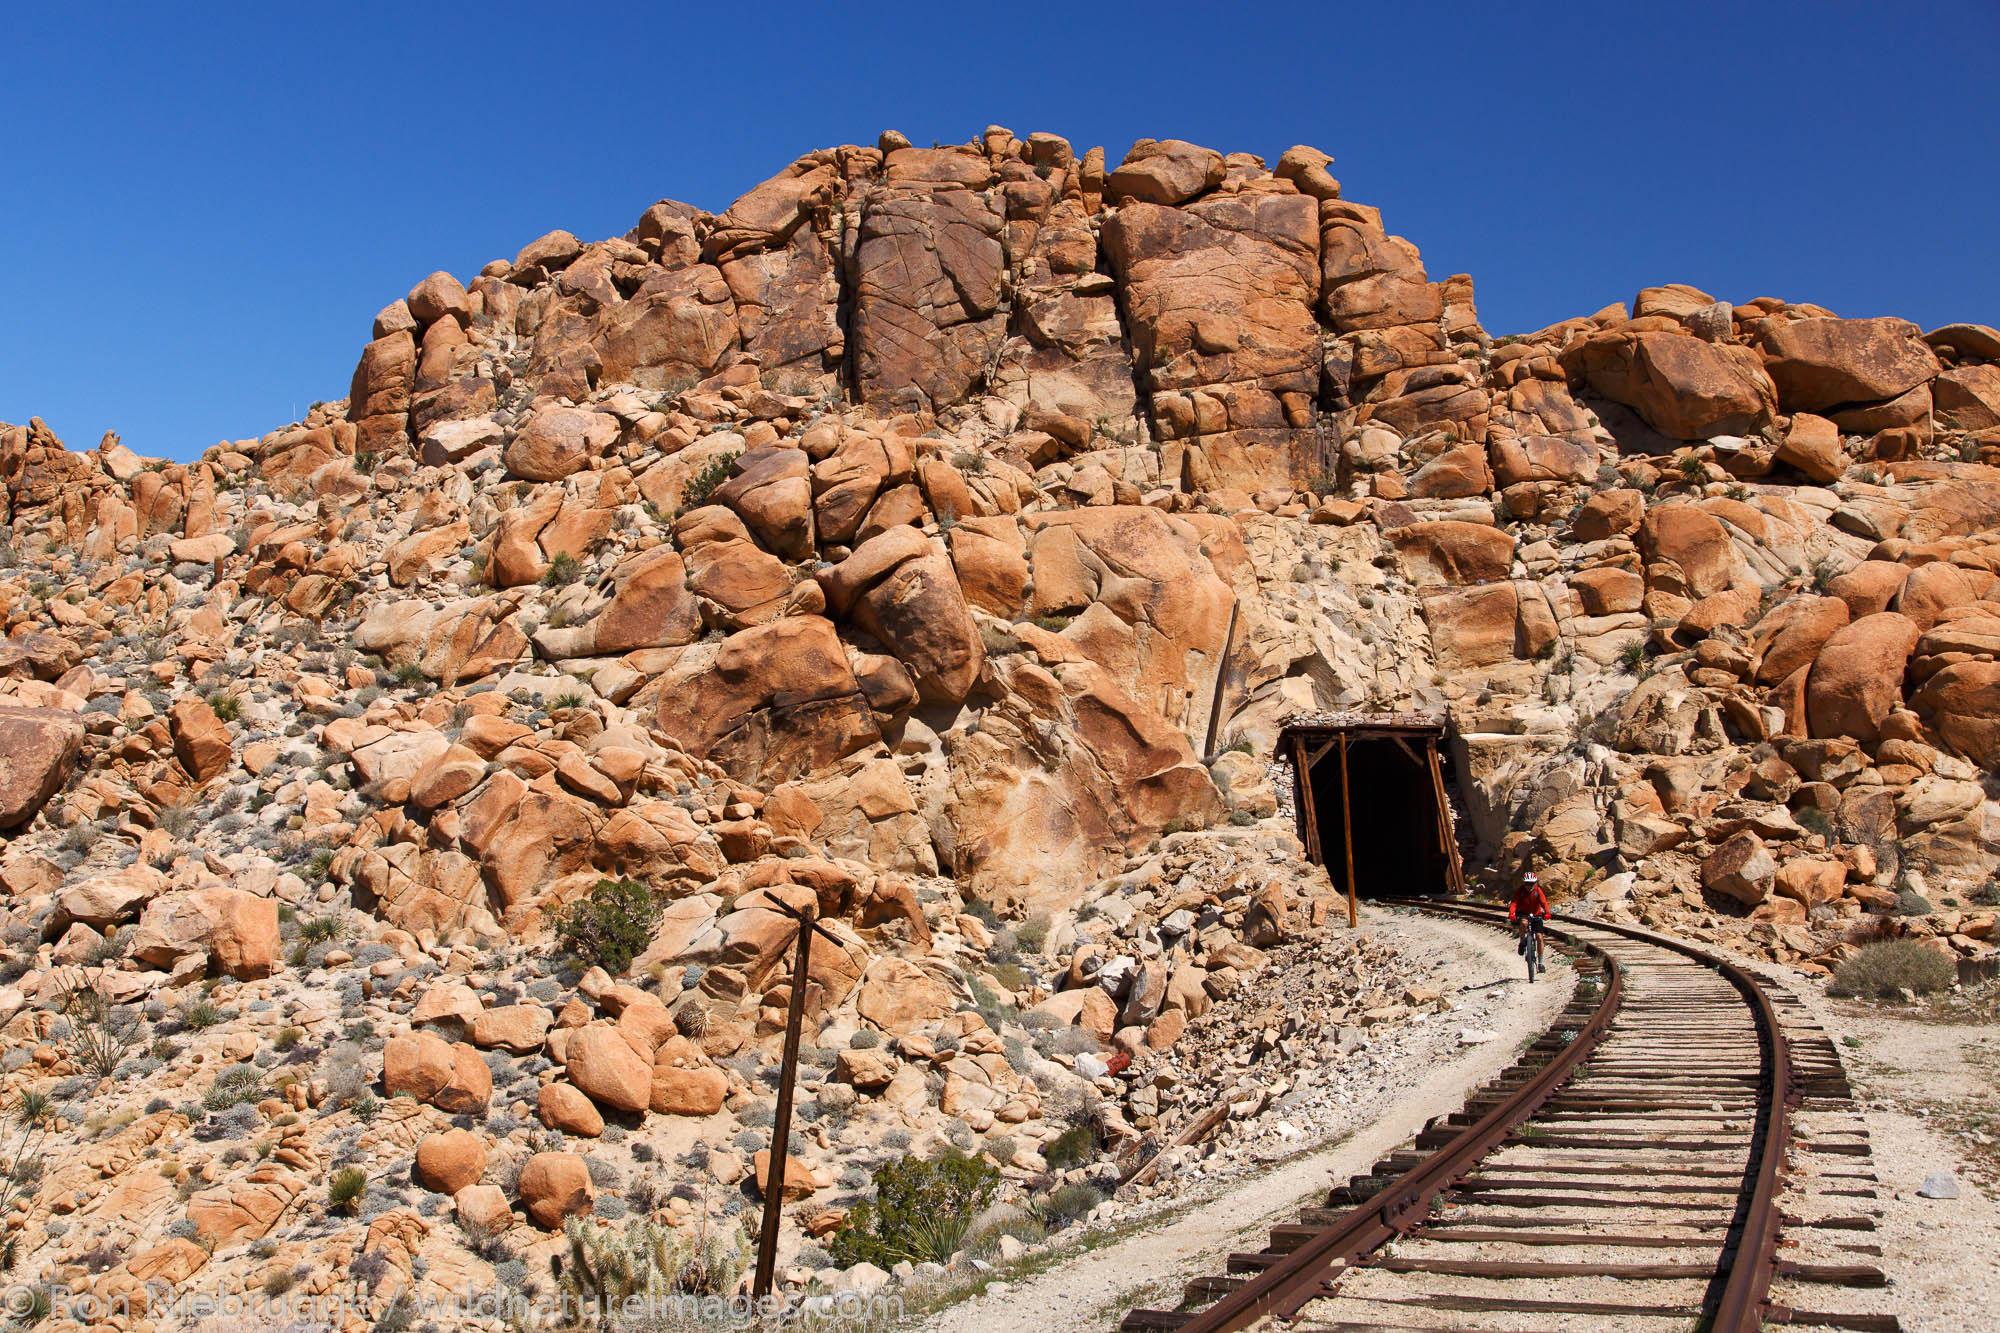 Mountain biking the Carrizo Gorge Railroad Track, Anza-Borrego Desert State Park, California.